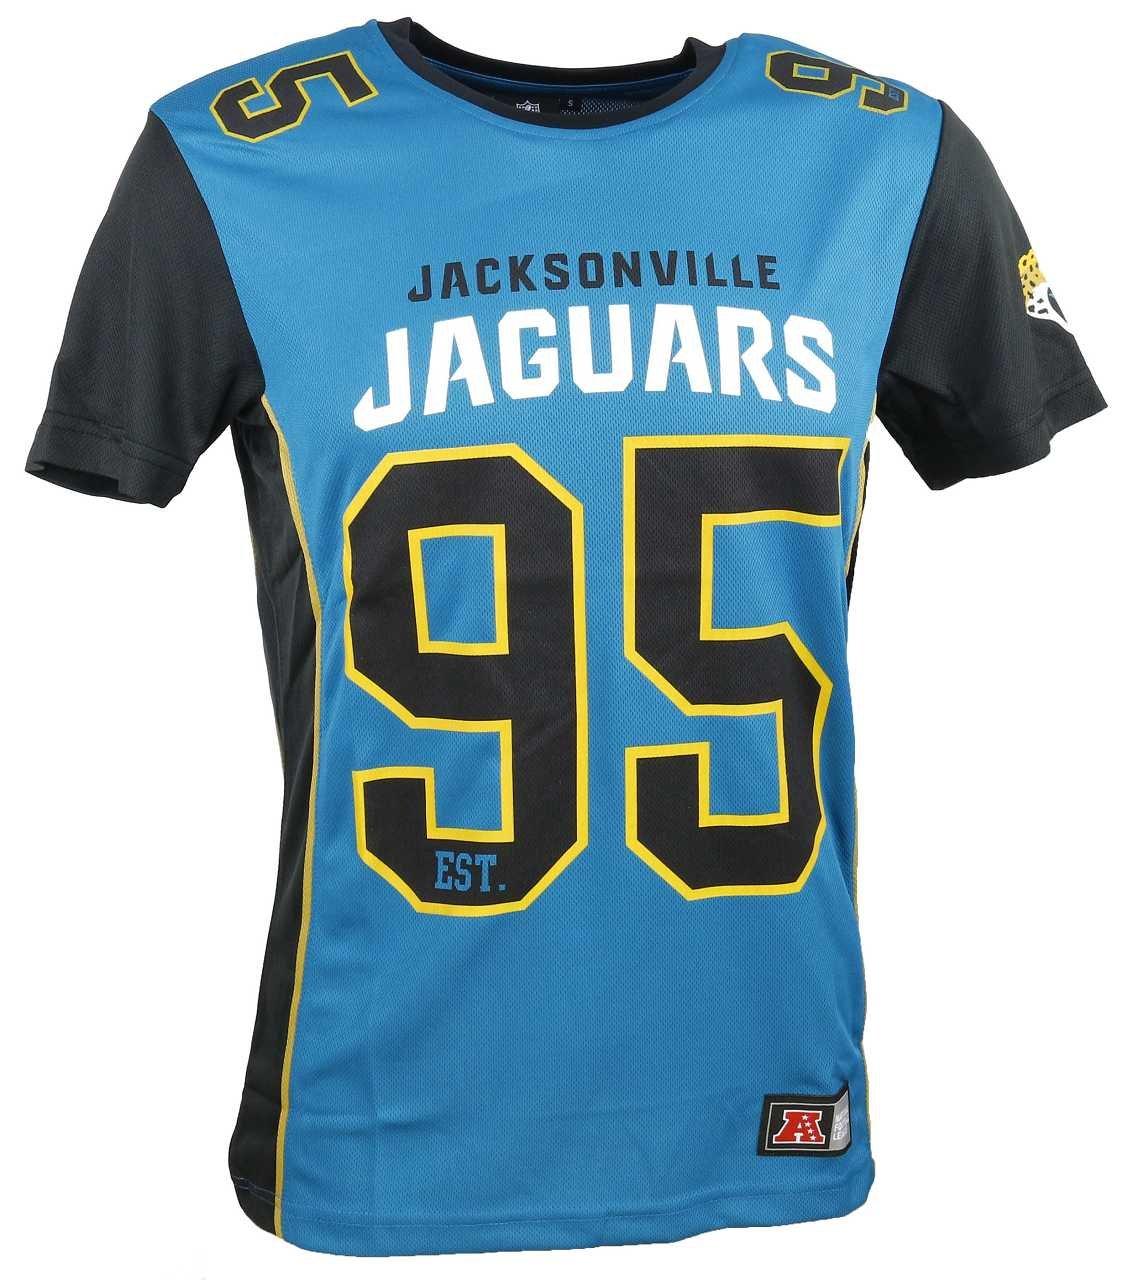 Jacksonville Jaguars NFL /'Greatness/' T shirt